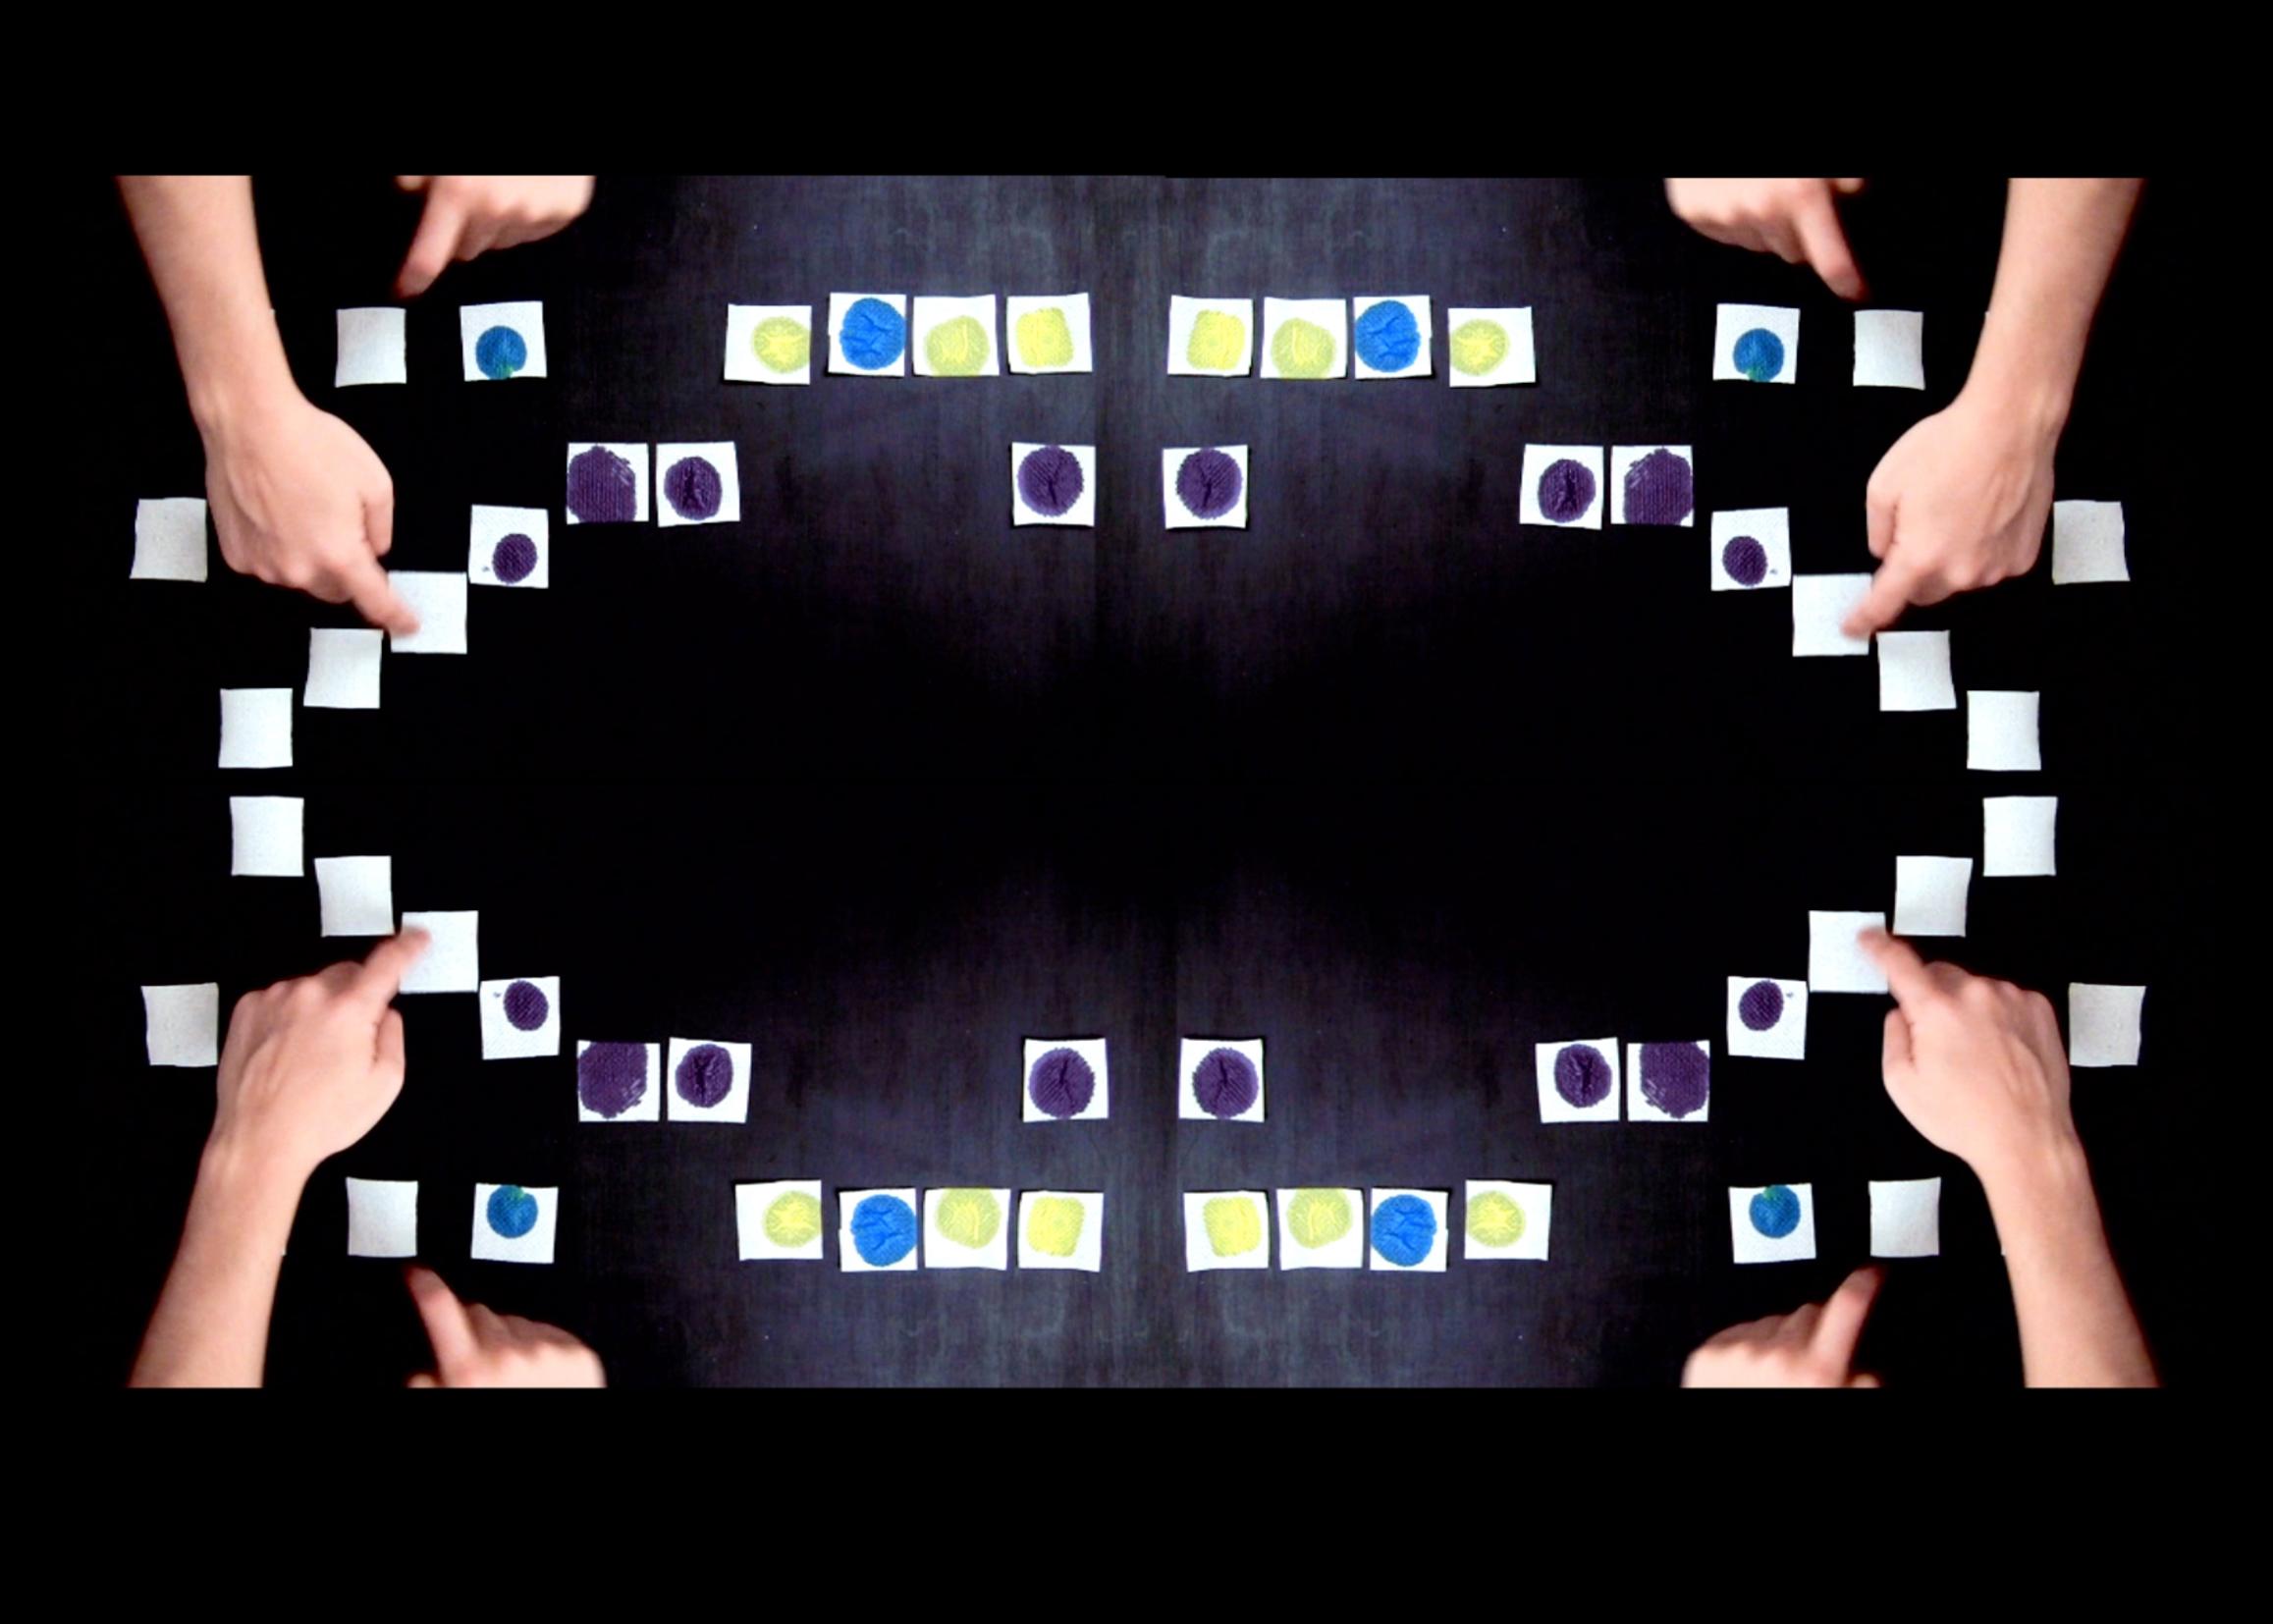 imaginary-instruments-6-inkboard